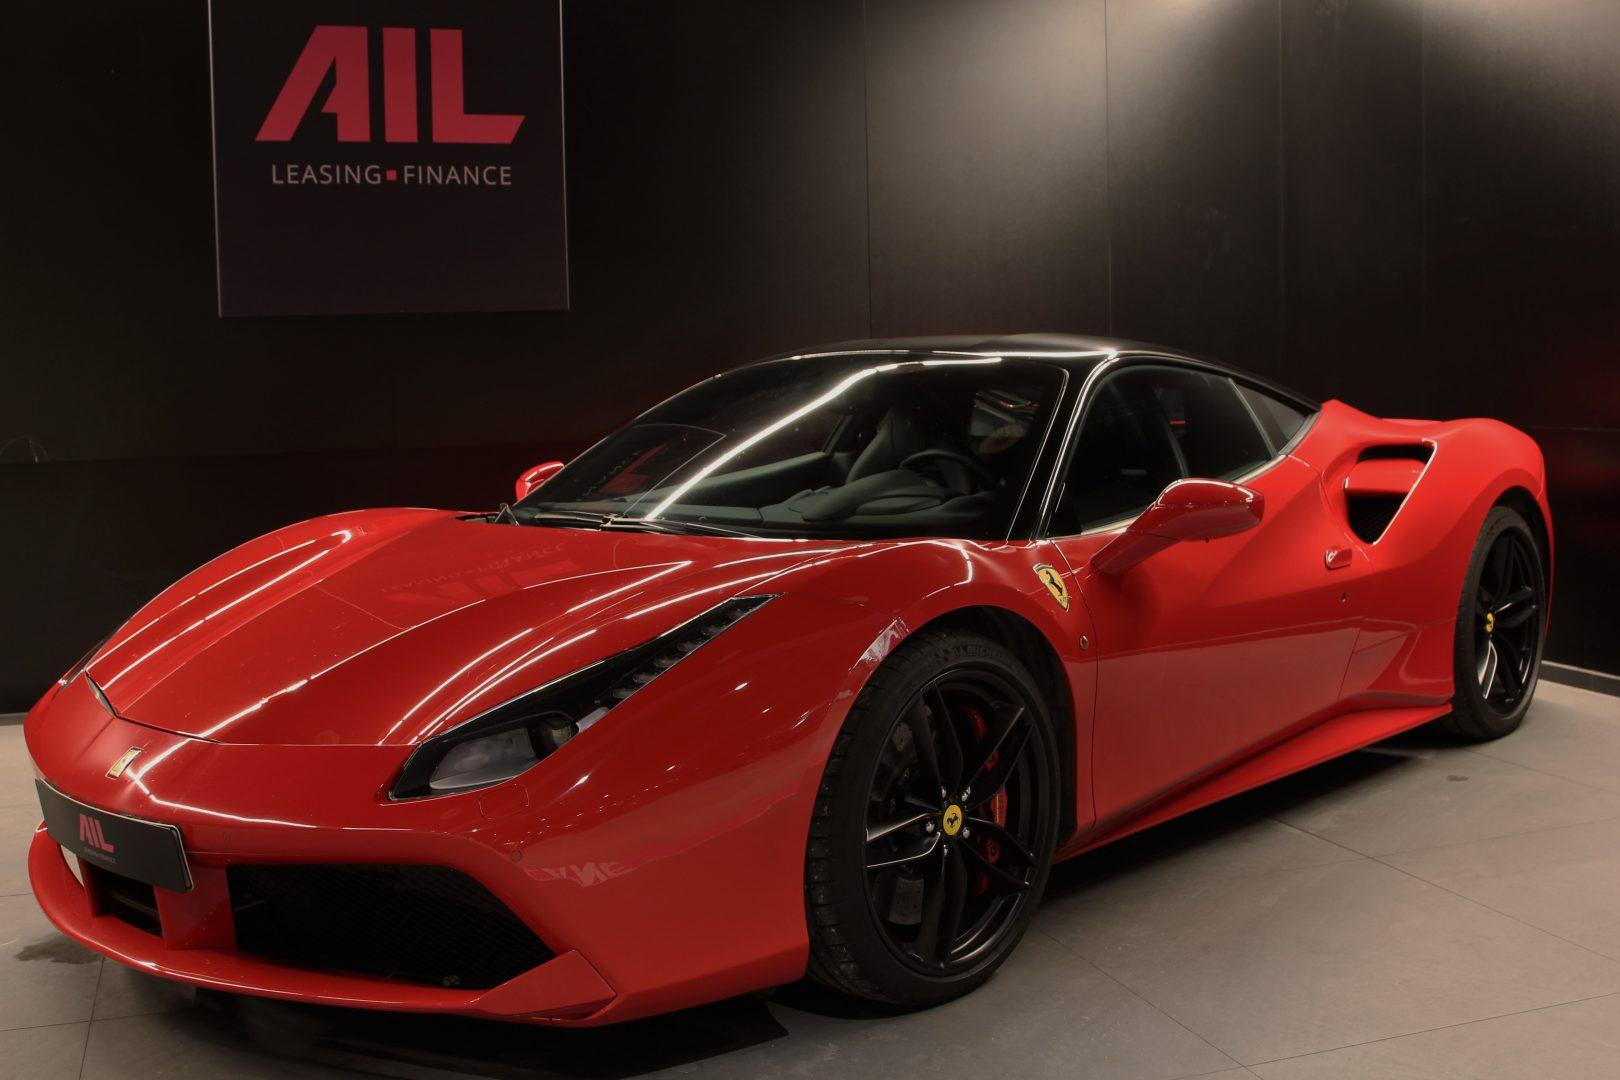 AIL Ferrari 488 GTB Rosso Corsa 12